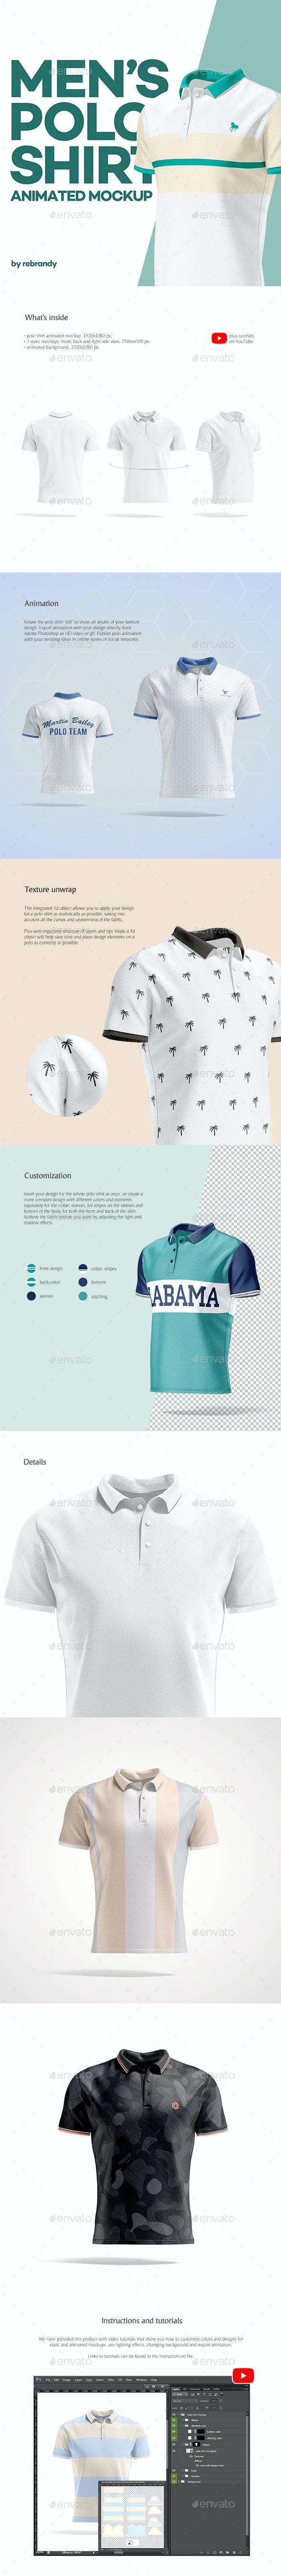 Men's Polo Shirt Animated Mockup - Product Mock-Ups Graphics